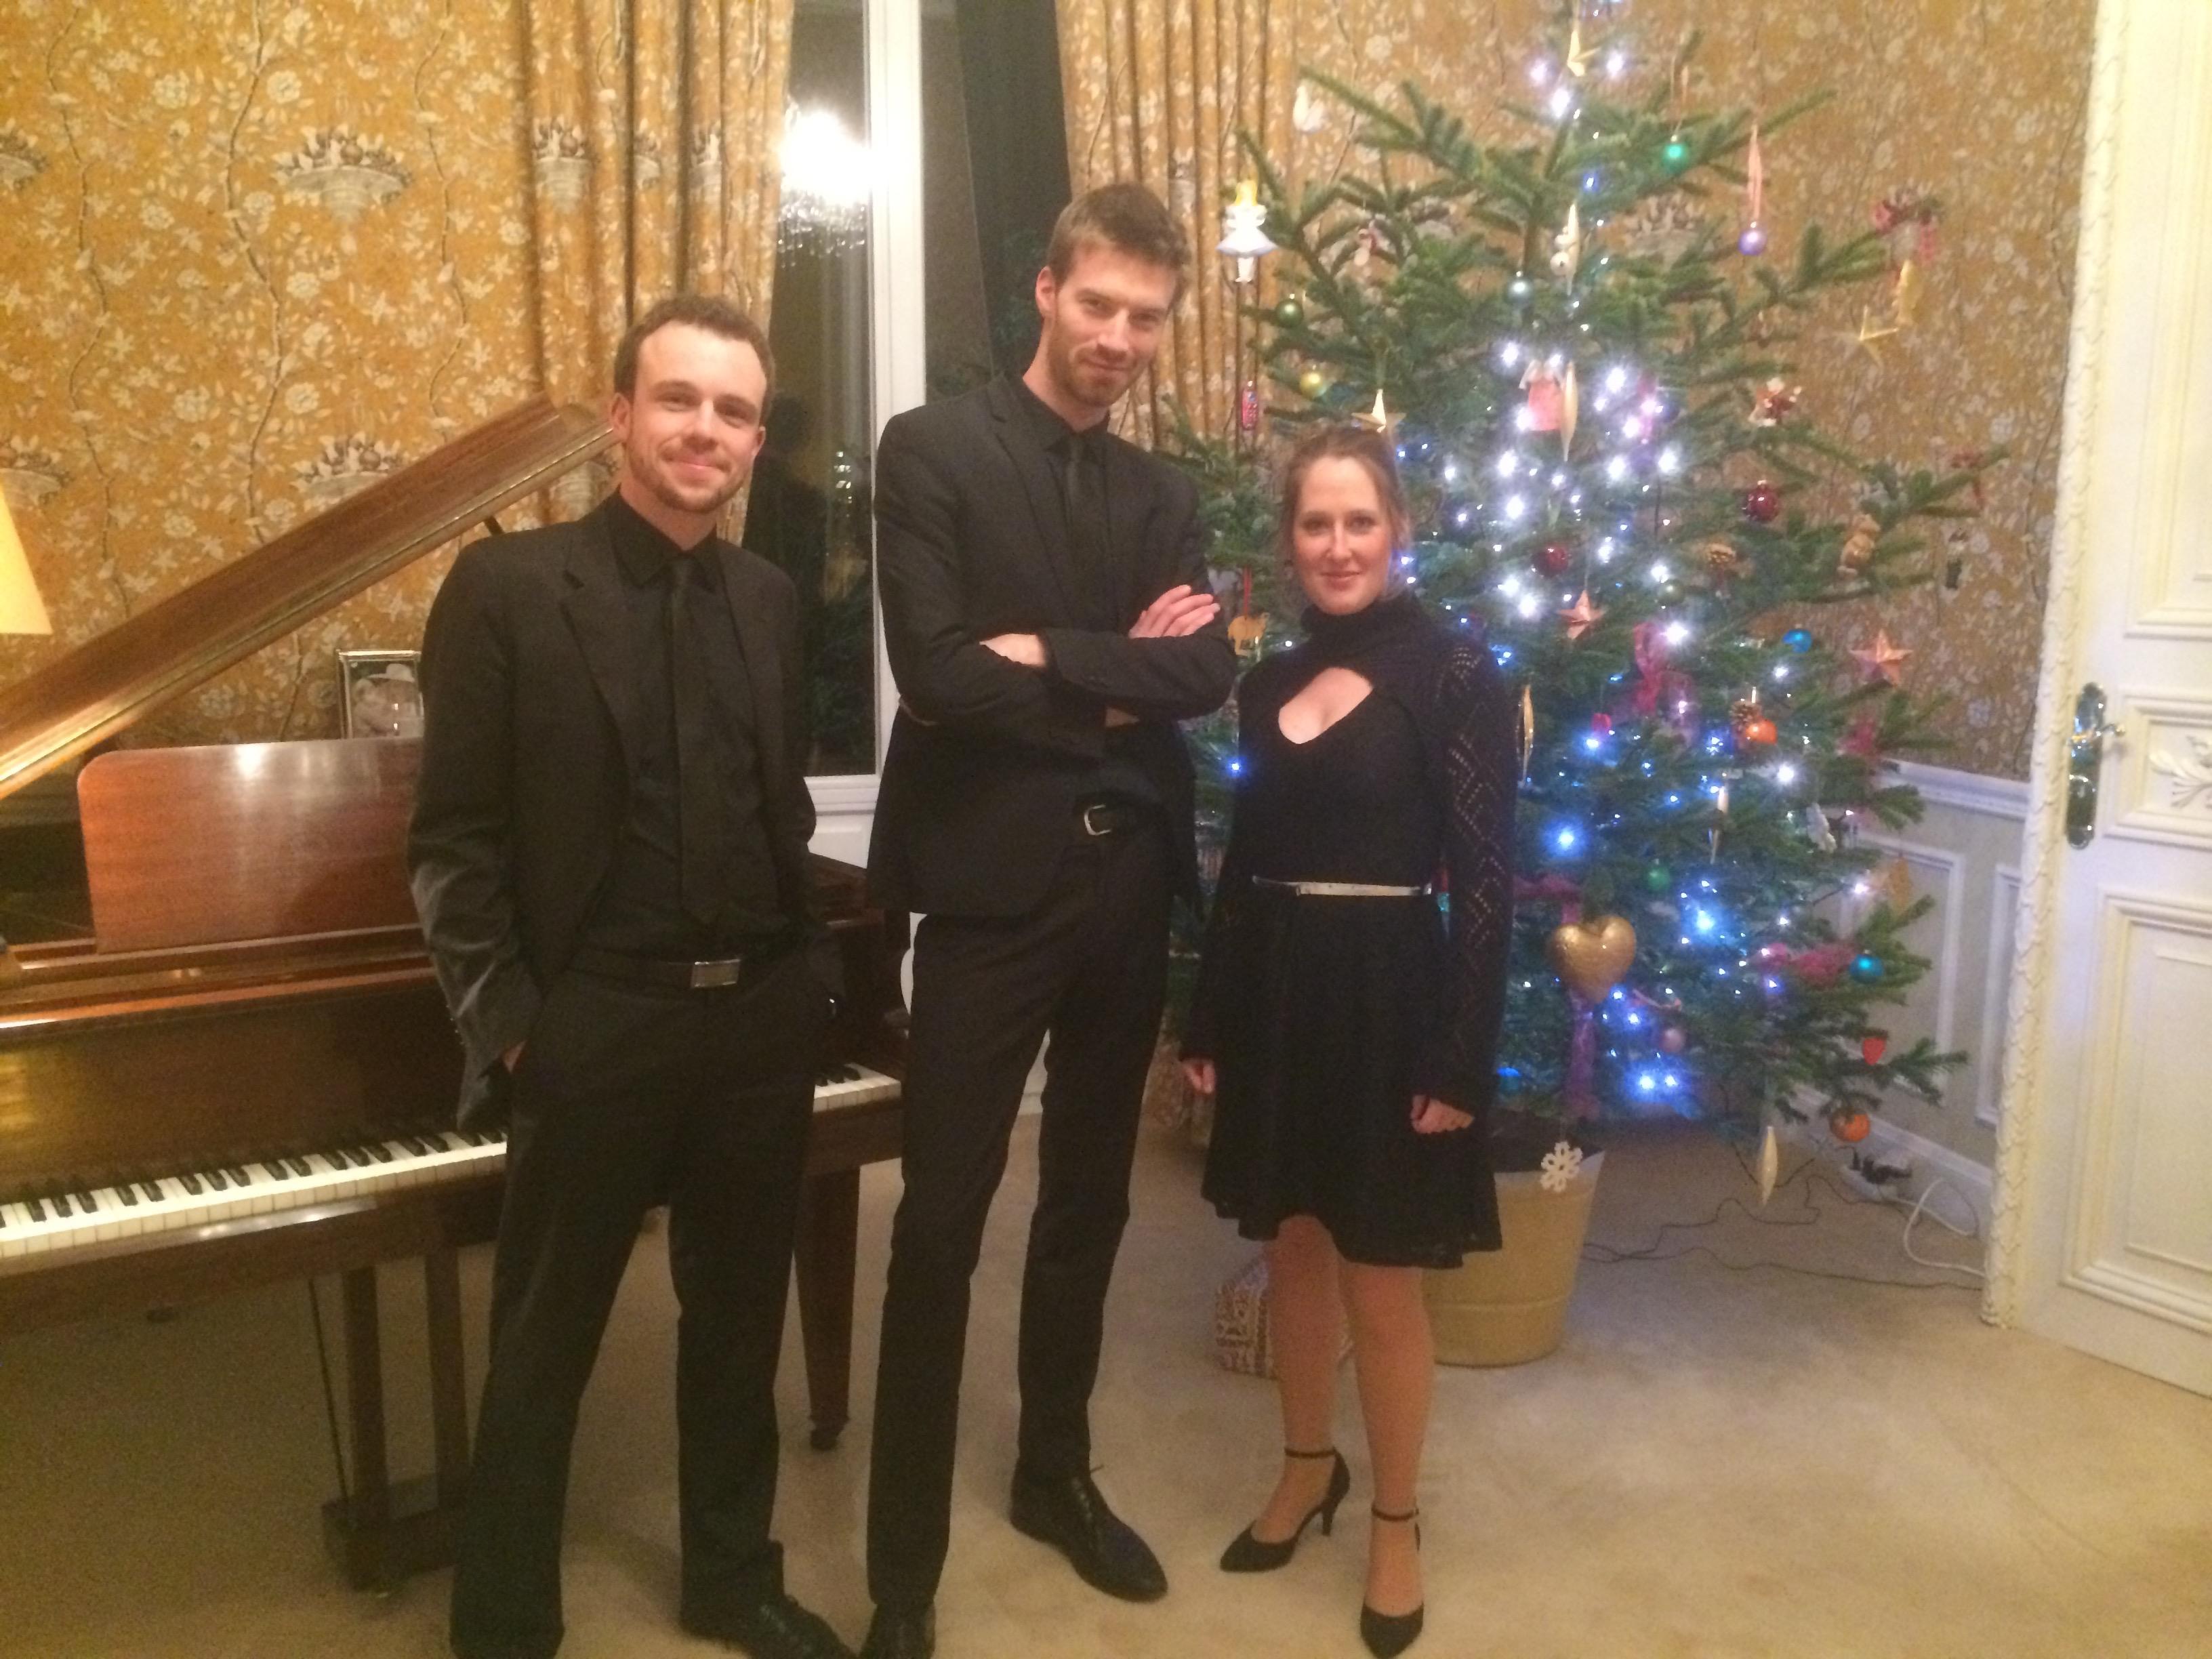 Concert de Noël à l'Ambassade d'Angleterre au Luxembourg